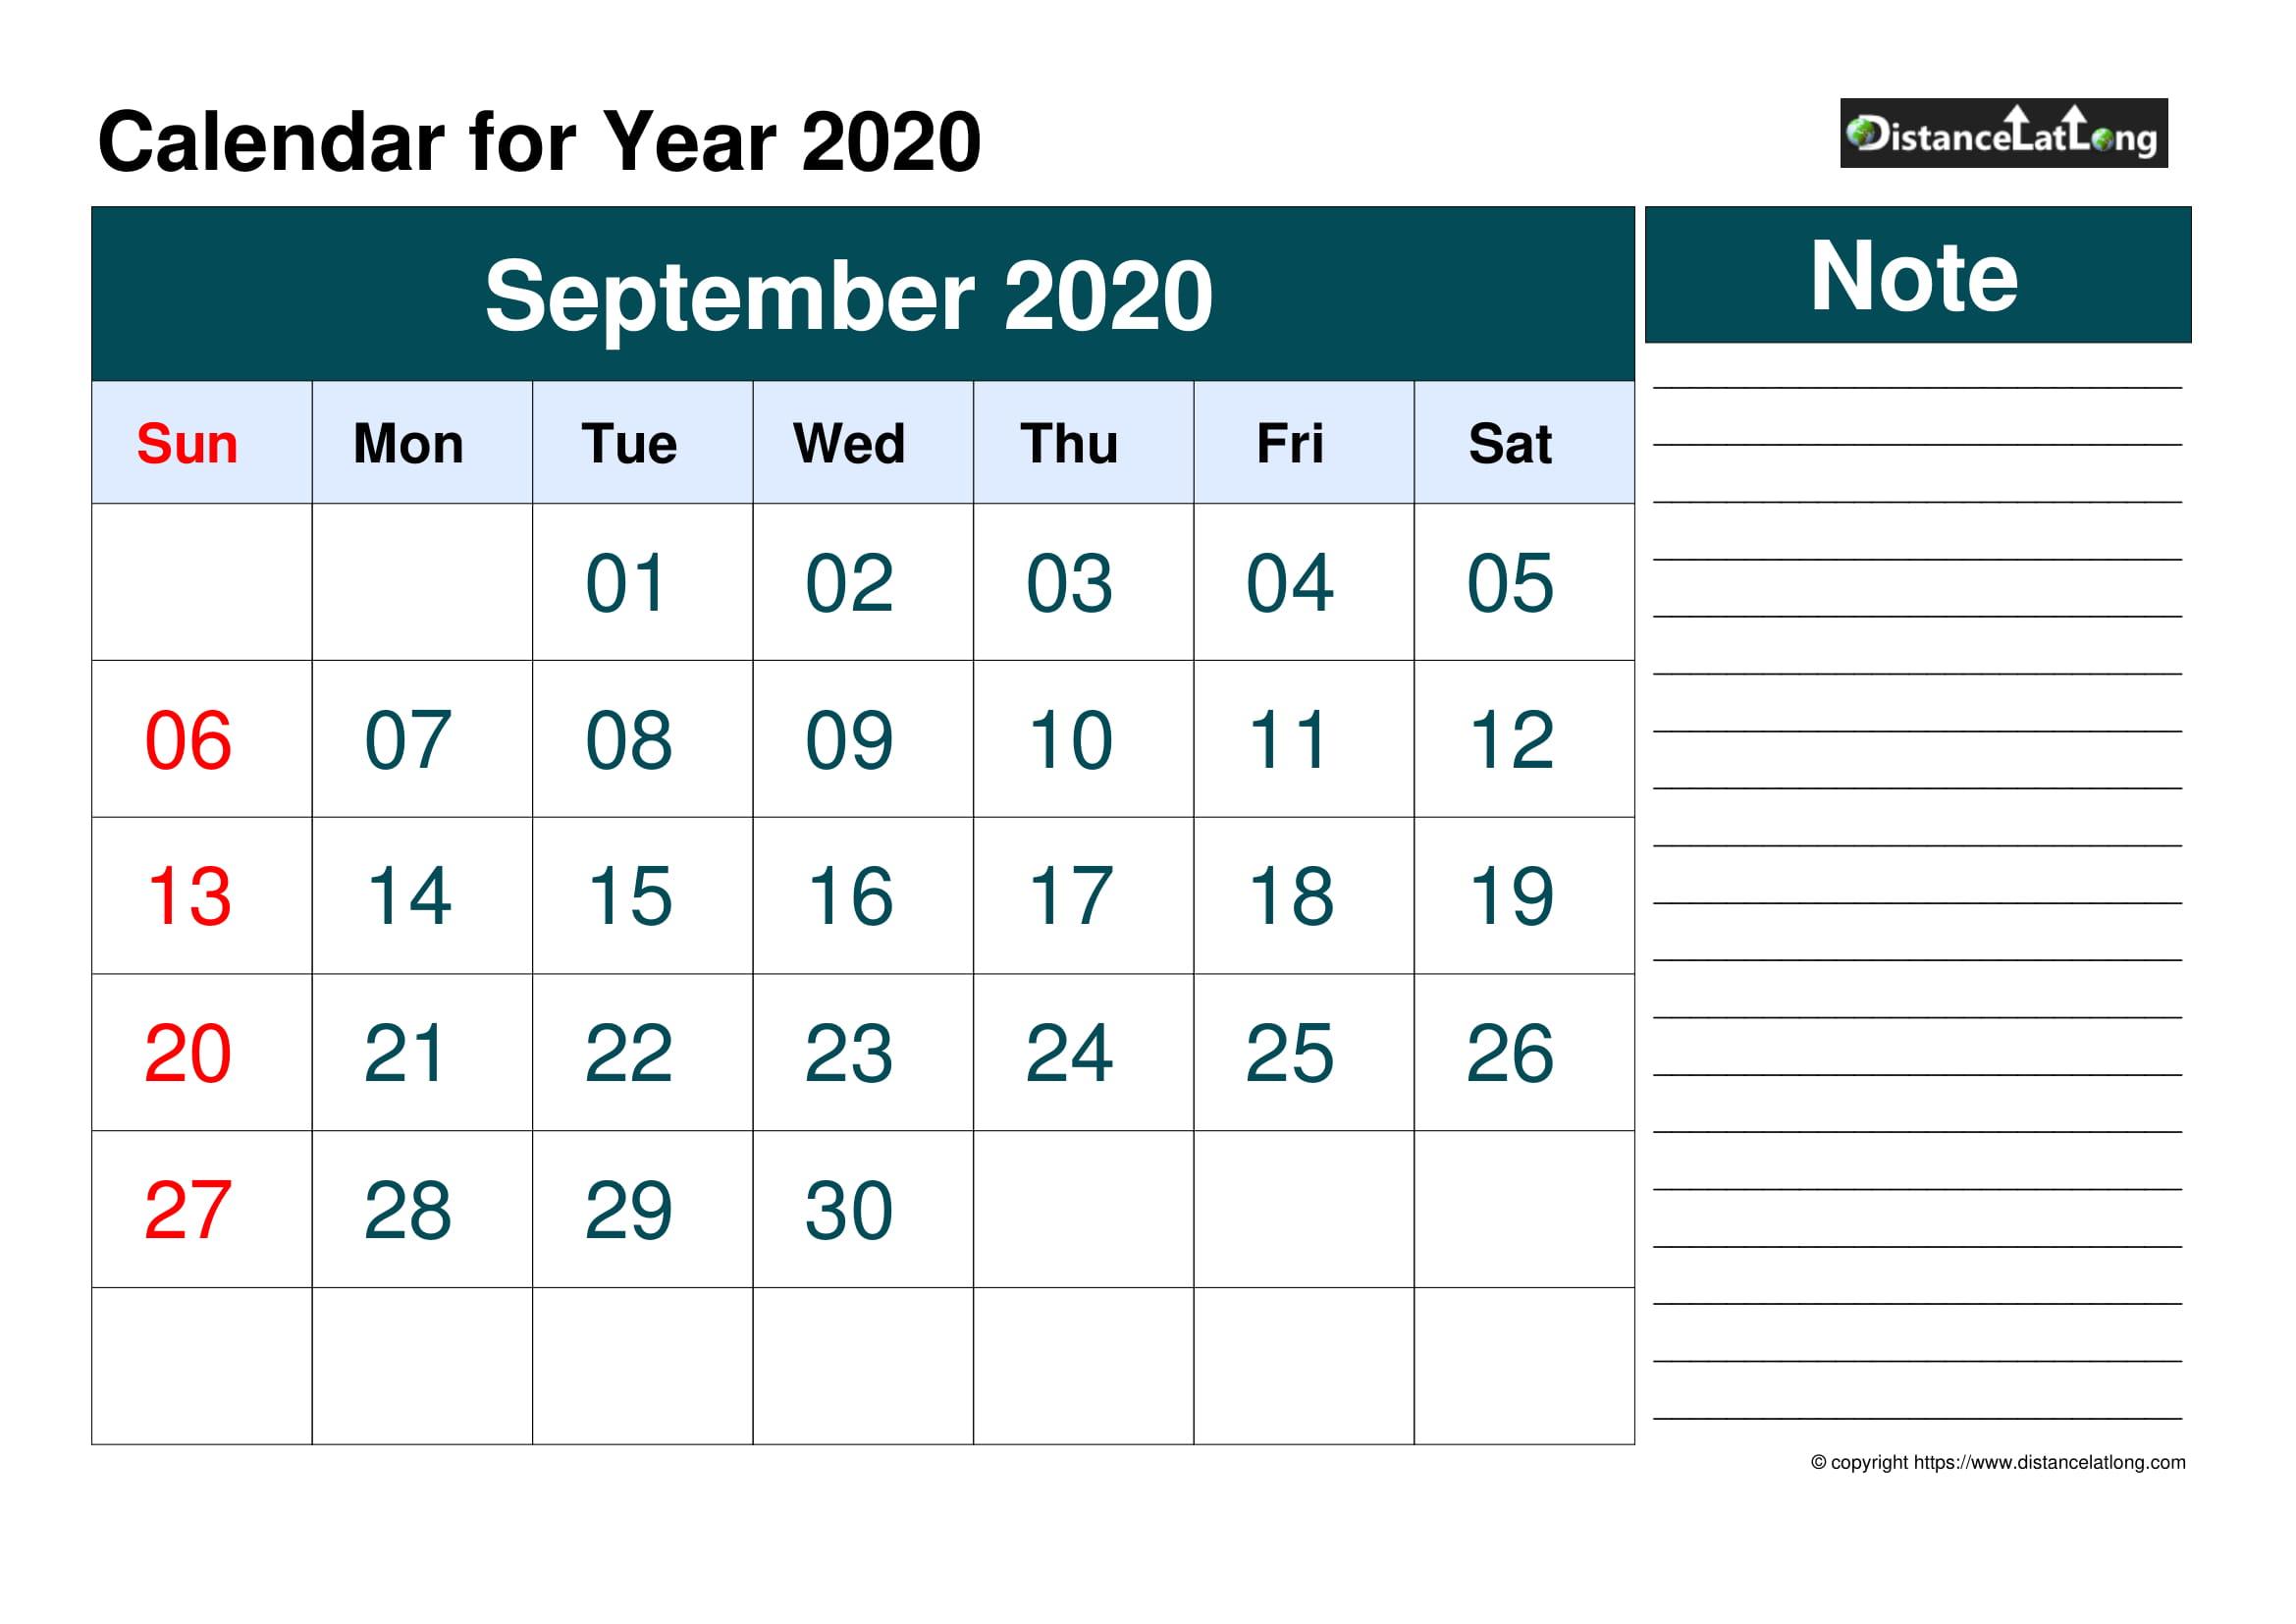 September 2020 Calendars For Pdf, Words And Jpg Formats inside Blank Sunday Through Saturday Calendar